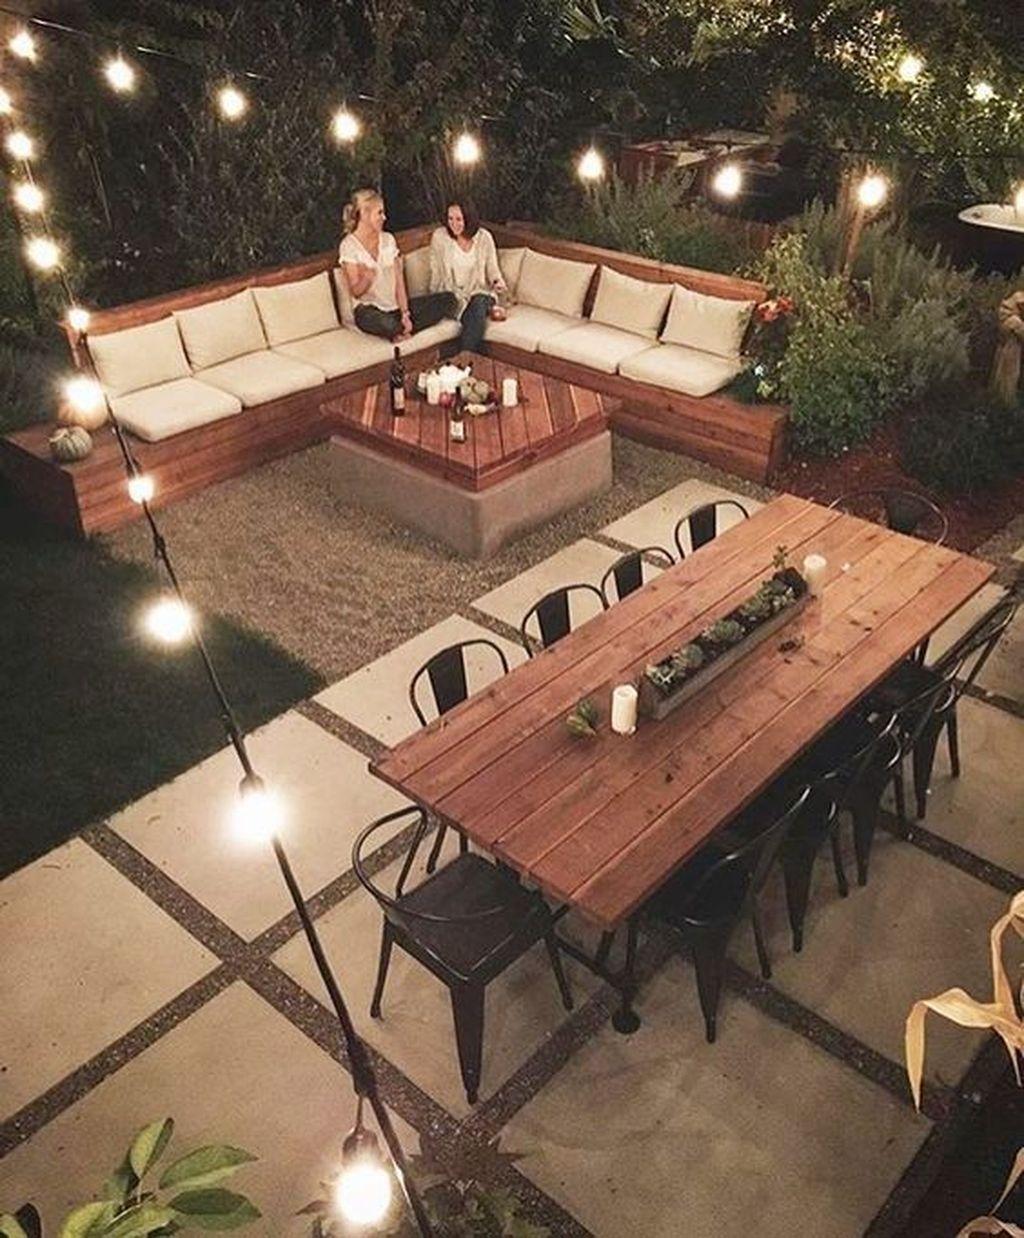 38 Inspiring Backyard Patio Design Ideas On A Budget #backyardpatiodesigns